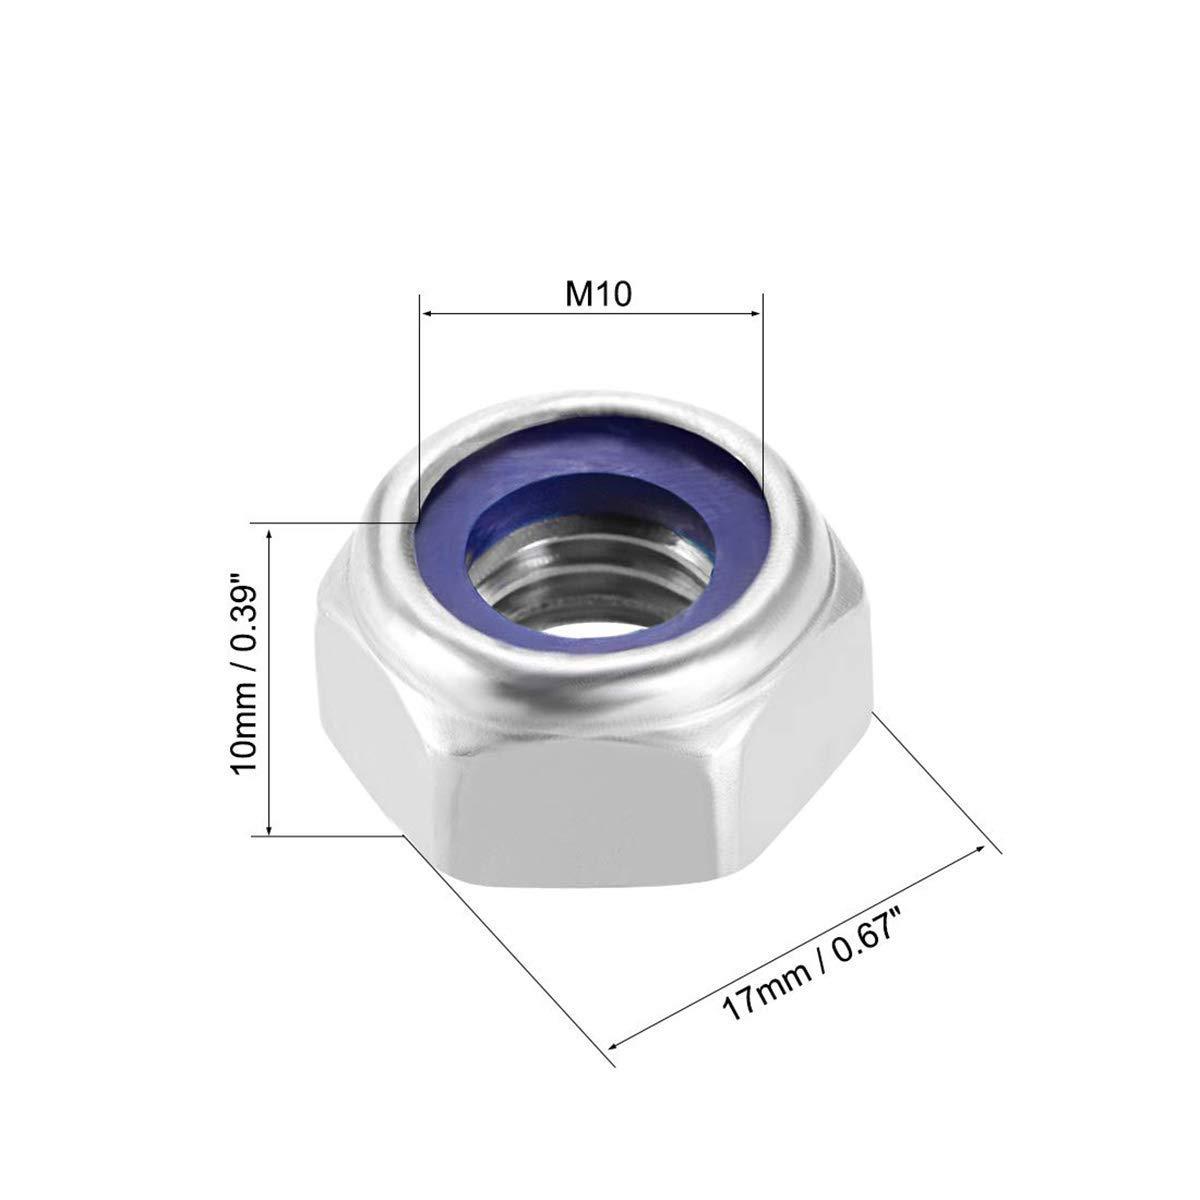 Liyafy M6 x 1mm Nylon Insert Hex Lock Nuts 304 Stainless Steel Lock Nut Assortment Kit 100Pcs